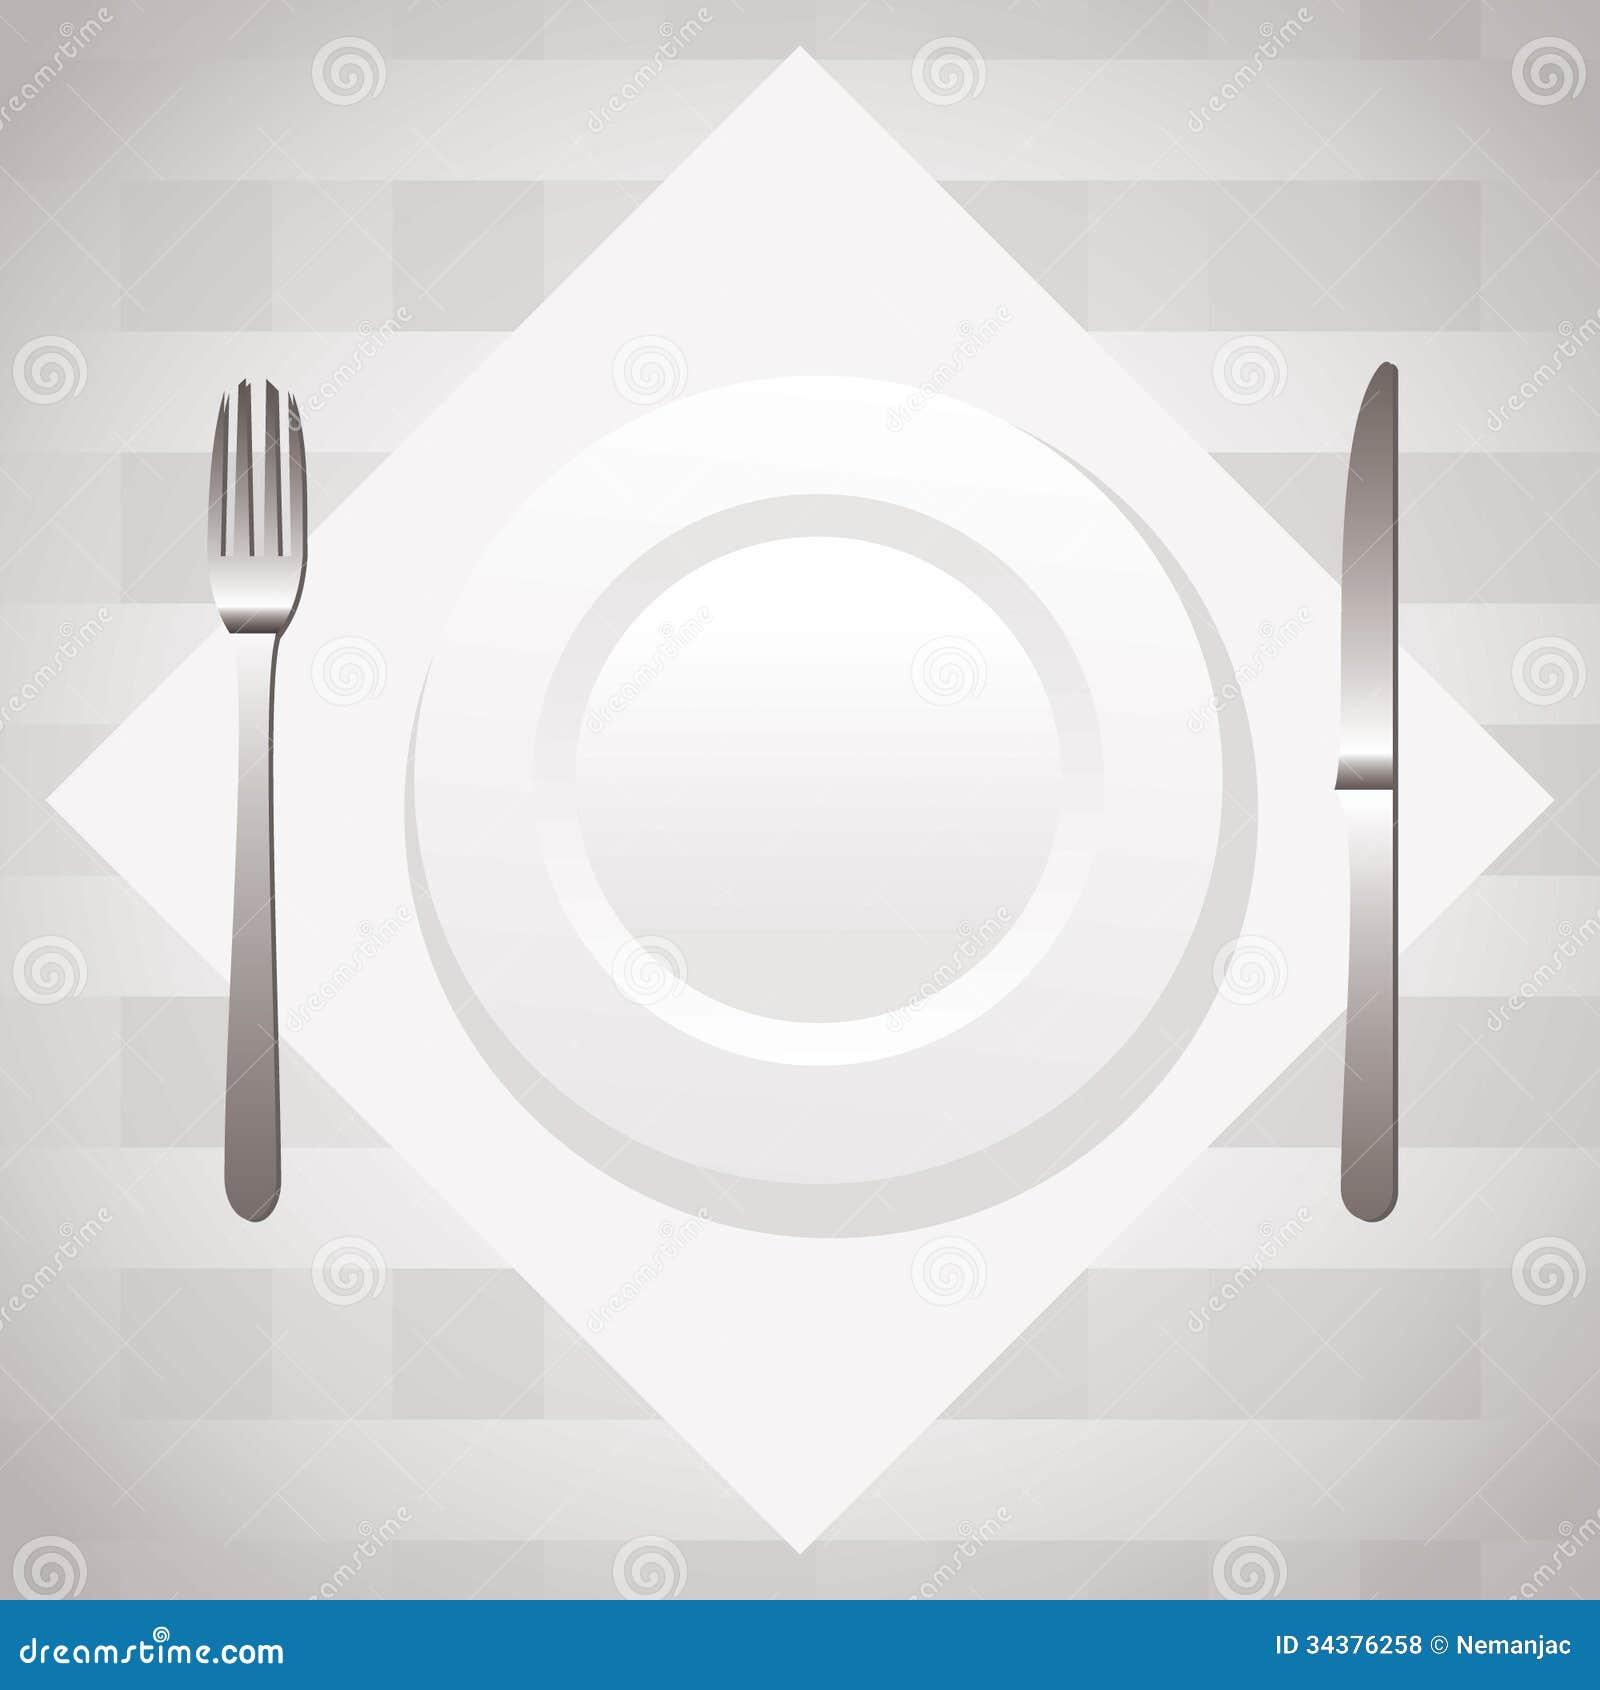 Table setting & Table setting stock vector. Illustration of porcelain - 34376258